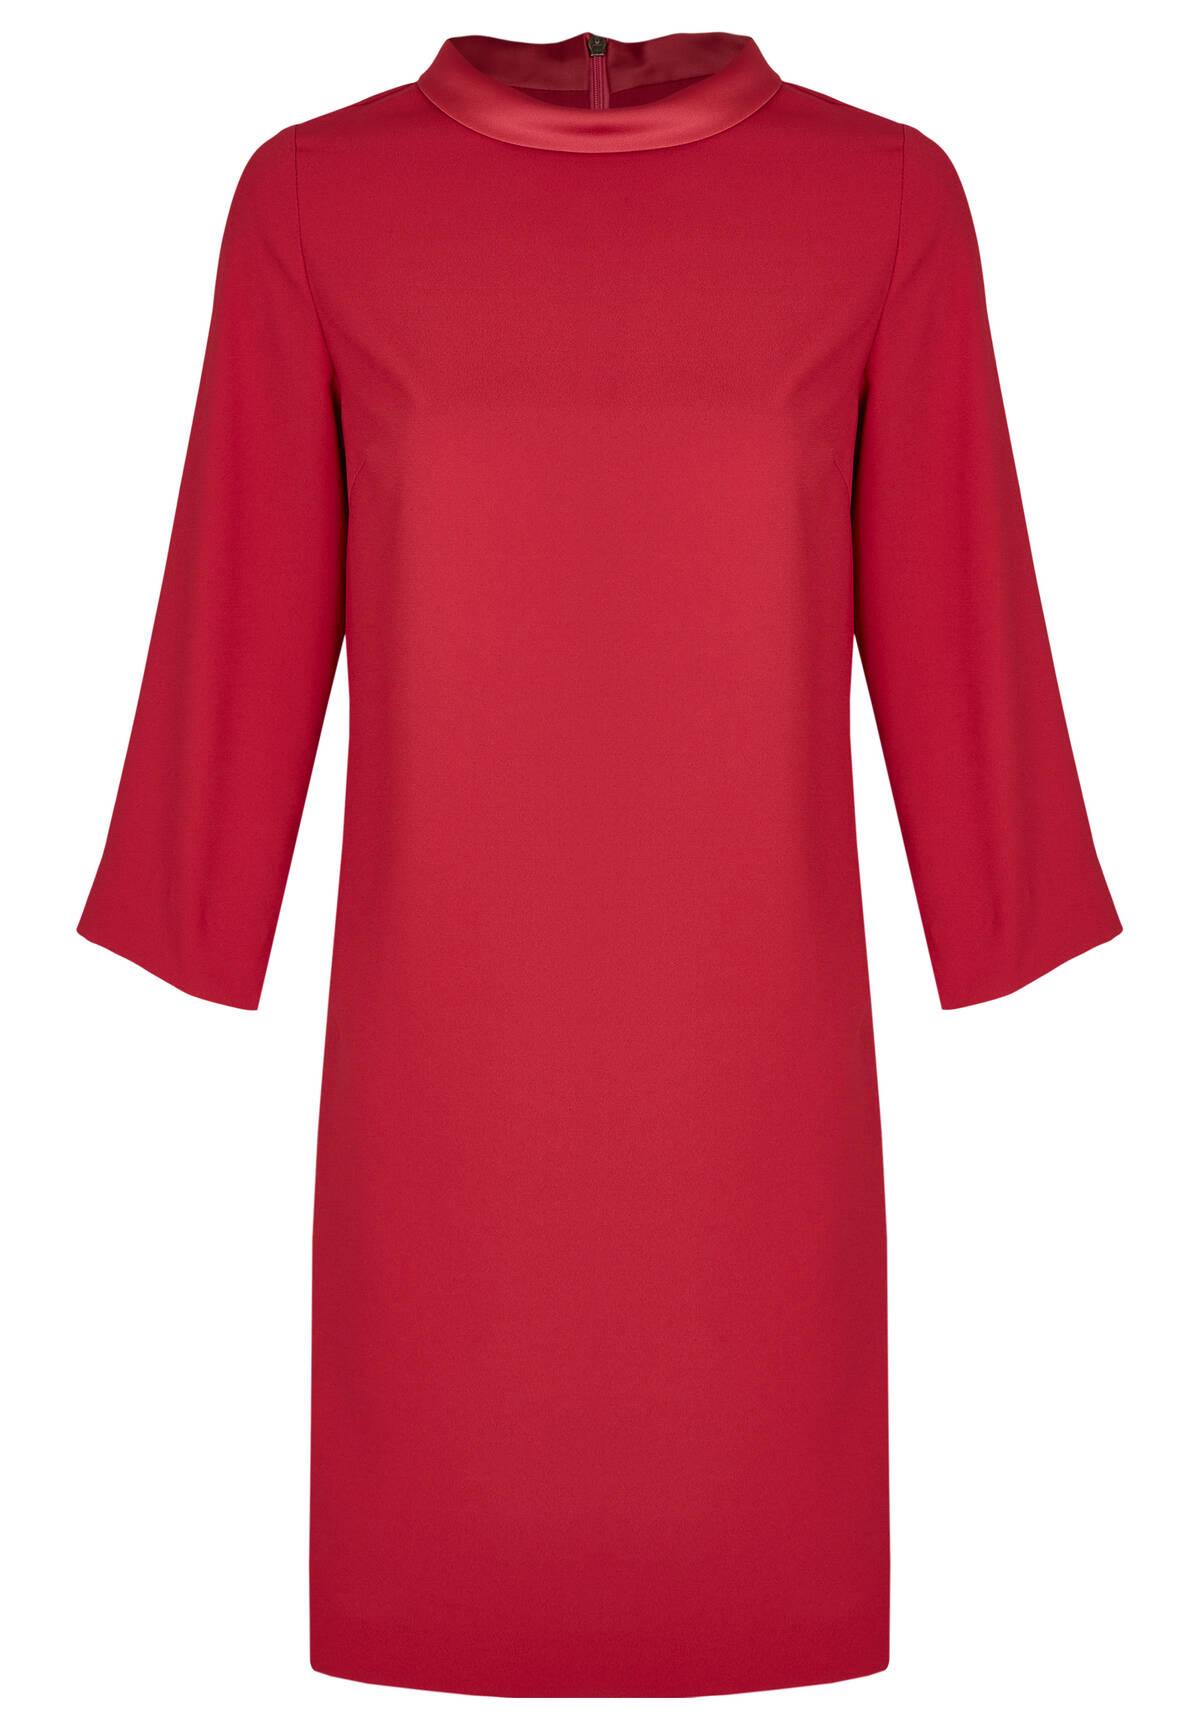 Elegantes Kleid / Dress